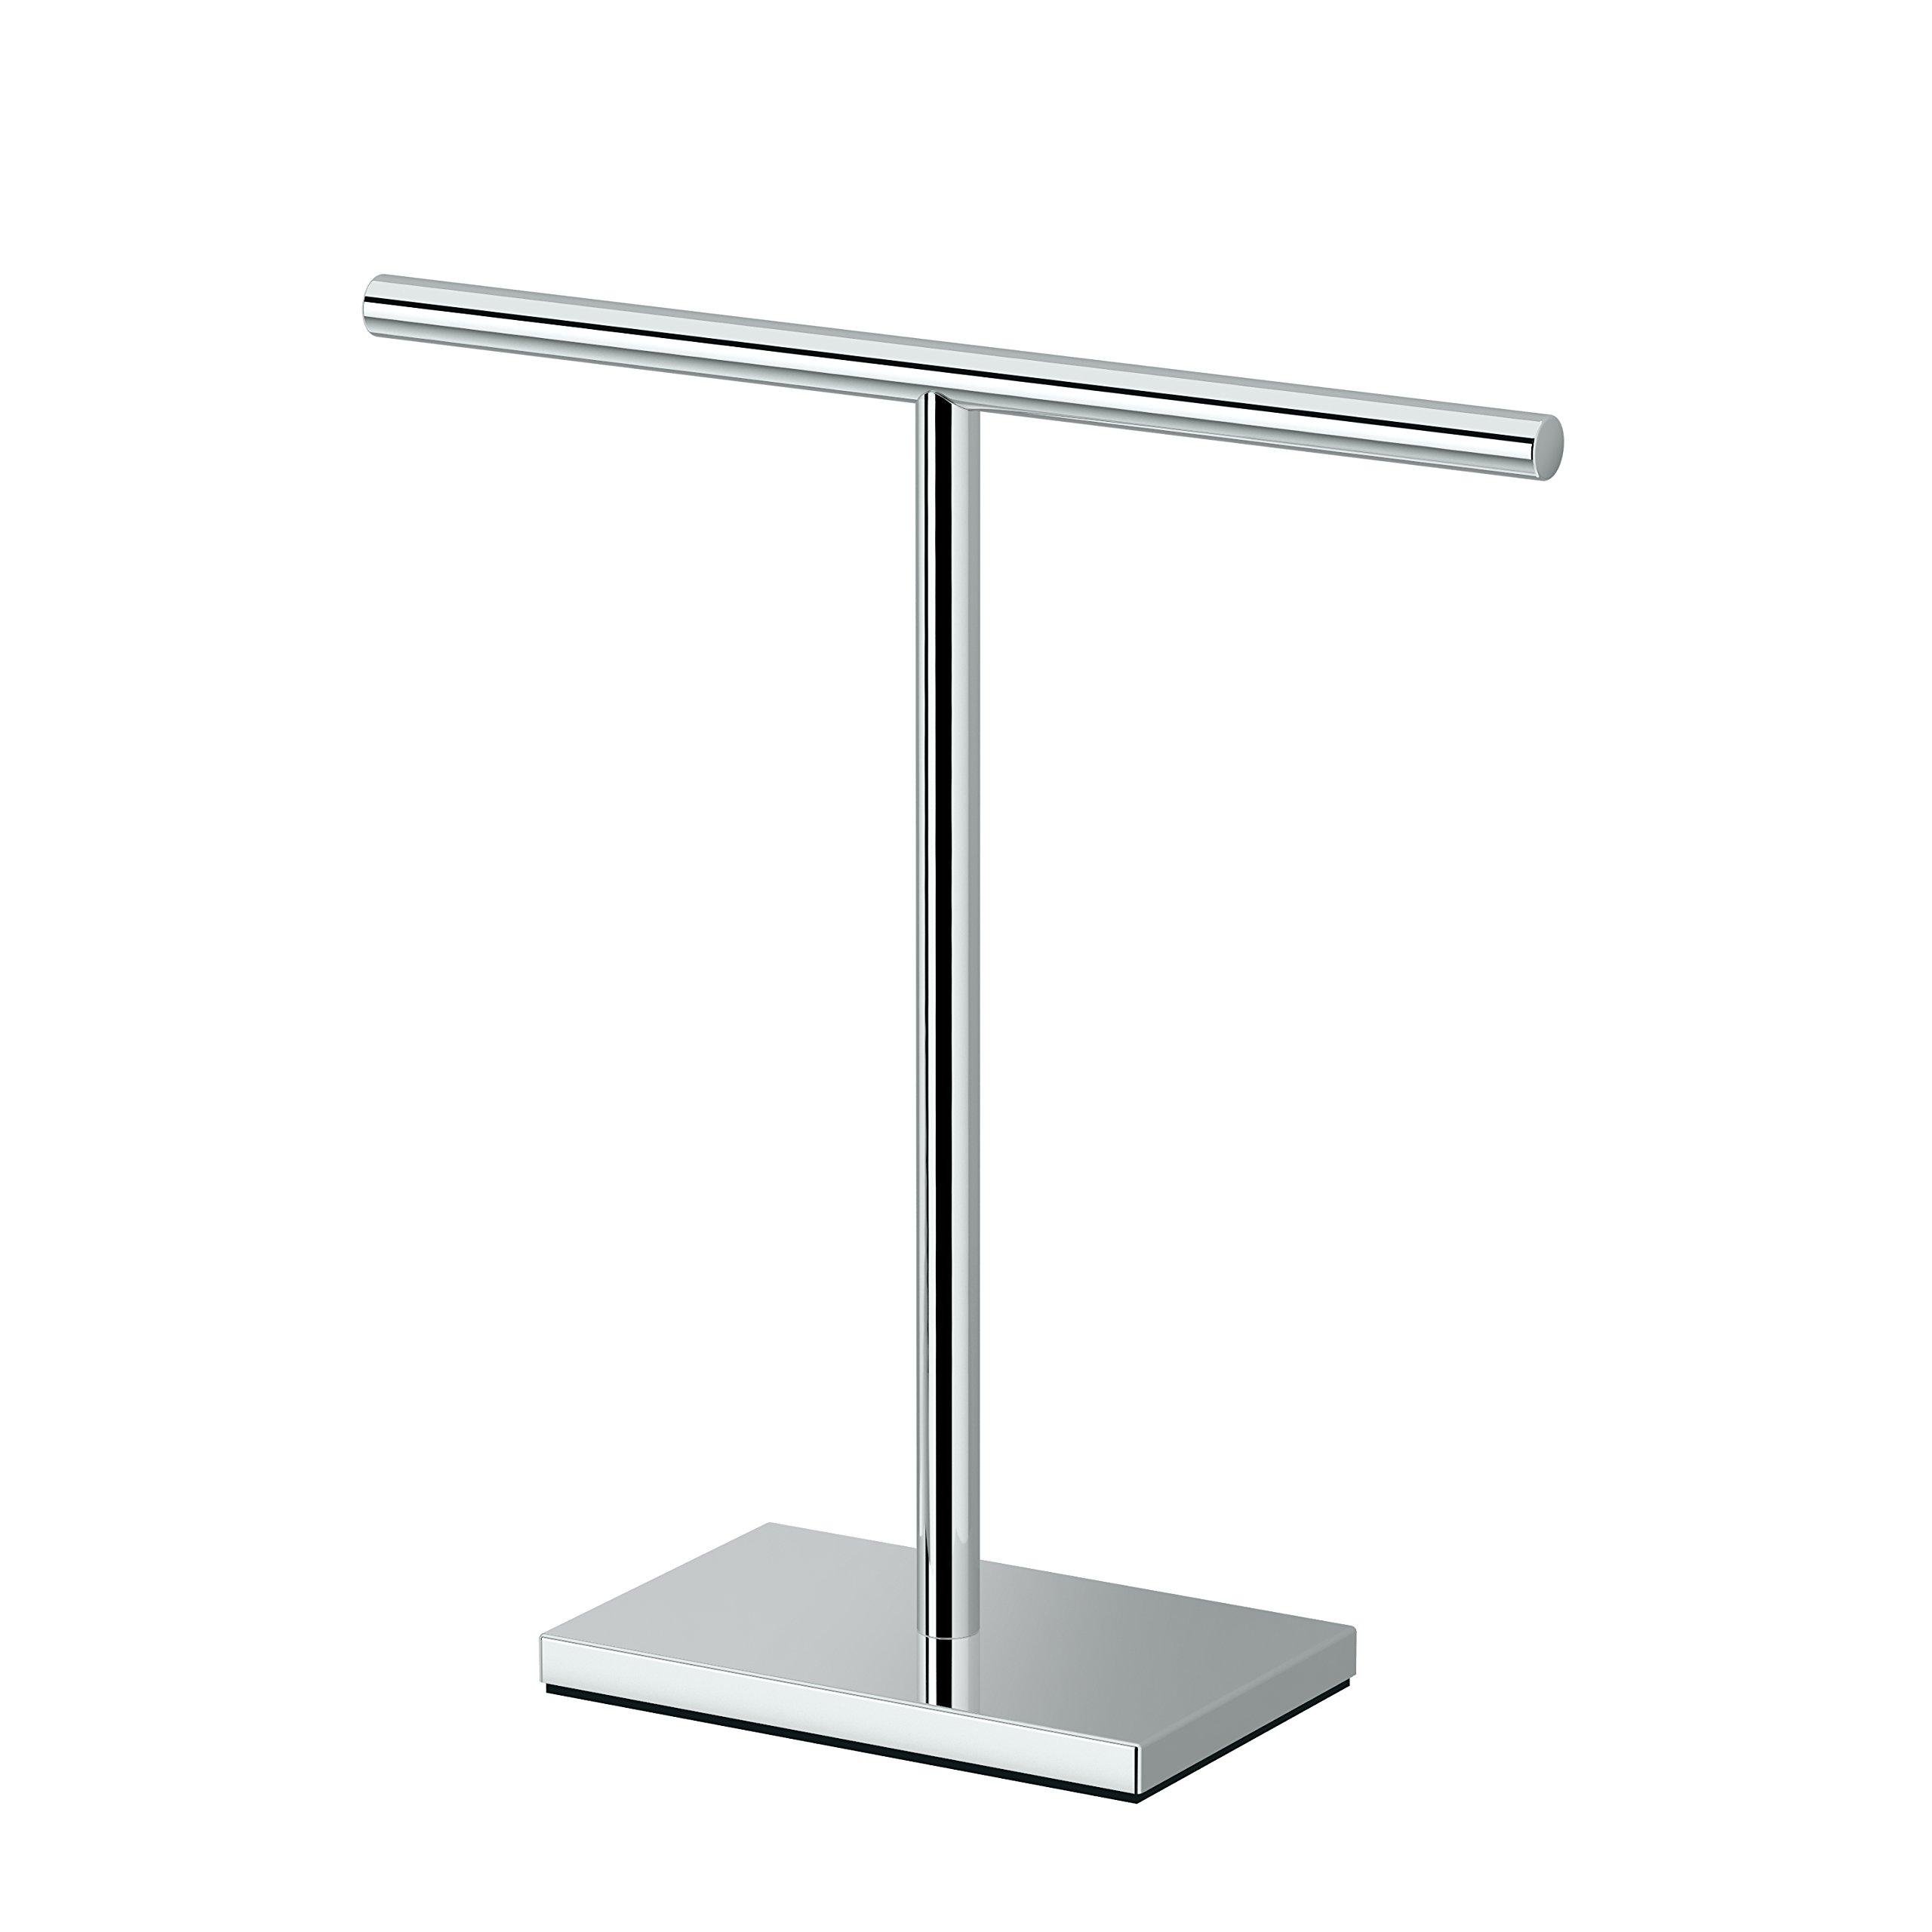 Gatco 1444C Modern Rectangle Base Bathroom Counter Top Hand Towel Holder, 11.13'' Height, Chrome